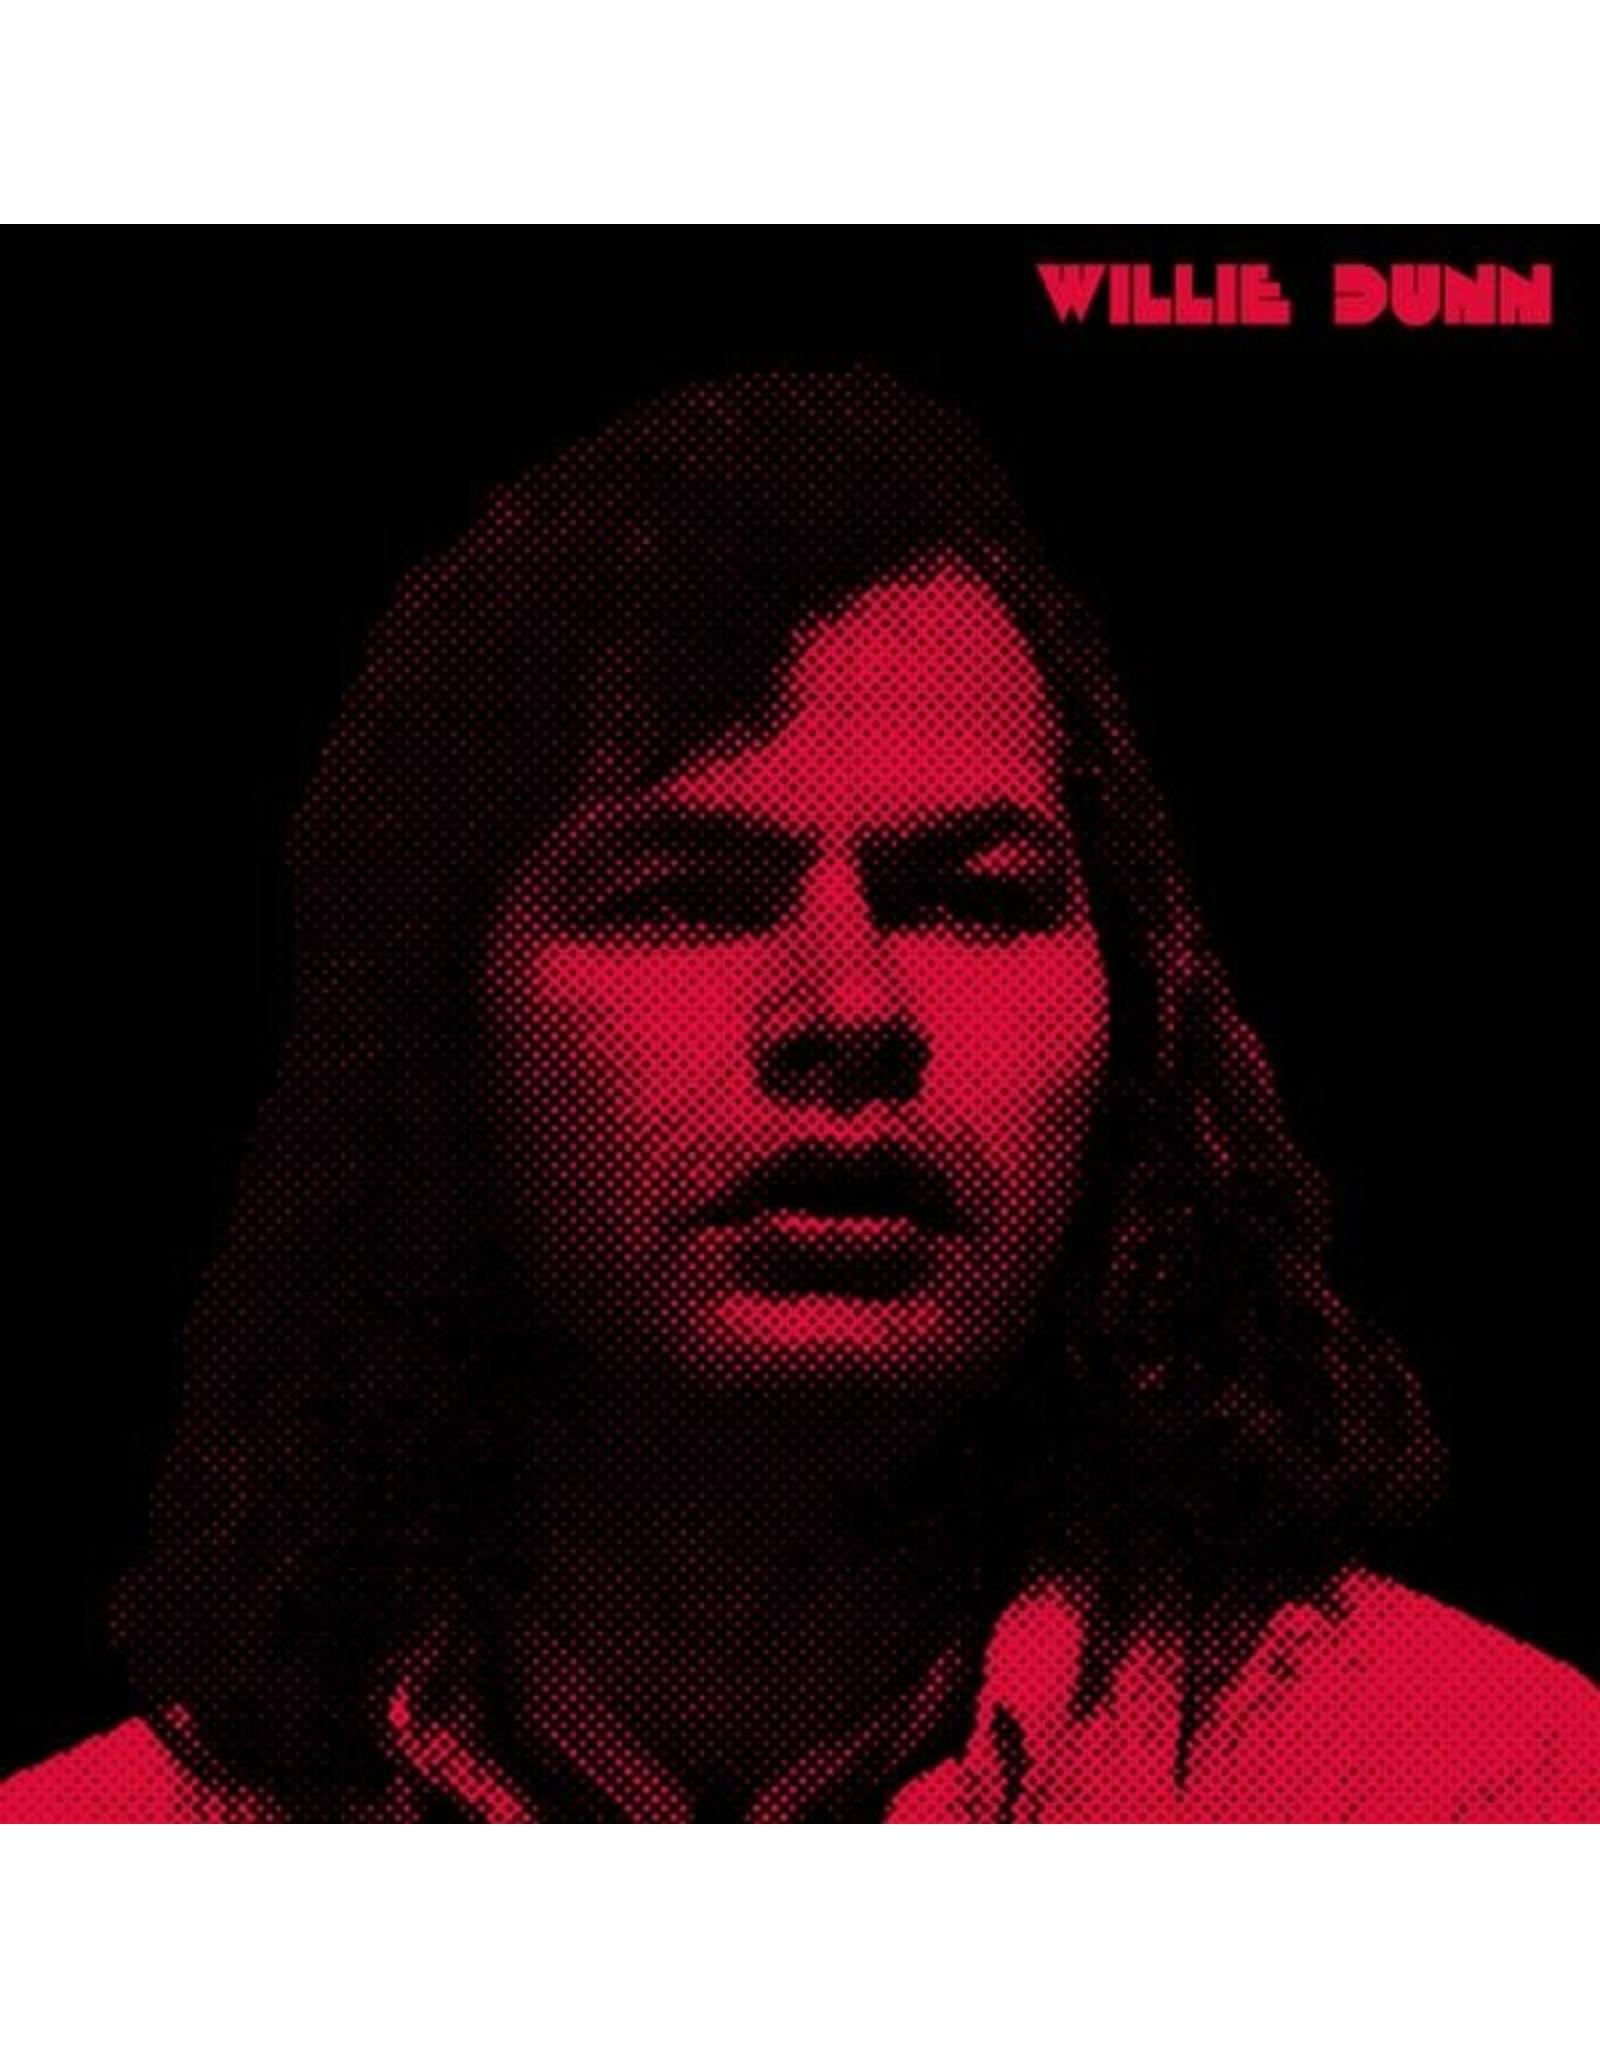 Dunn, Willie - Creation Never Sleeps, Creation Never Dies: The Willie Dunn Anthology LP